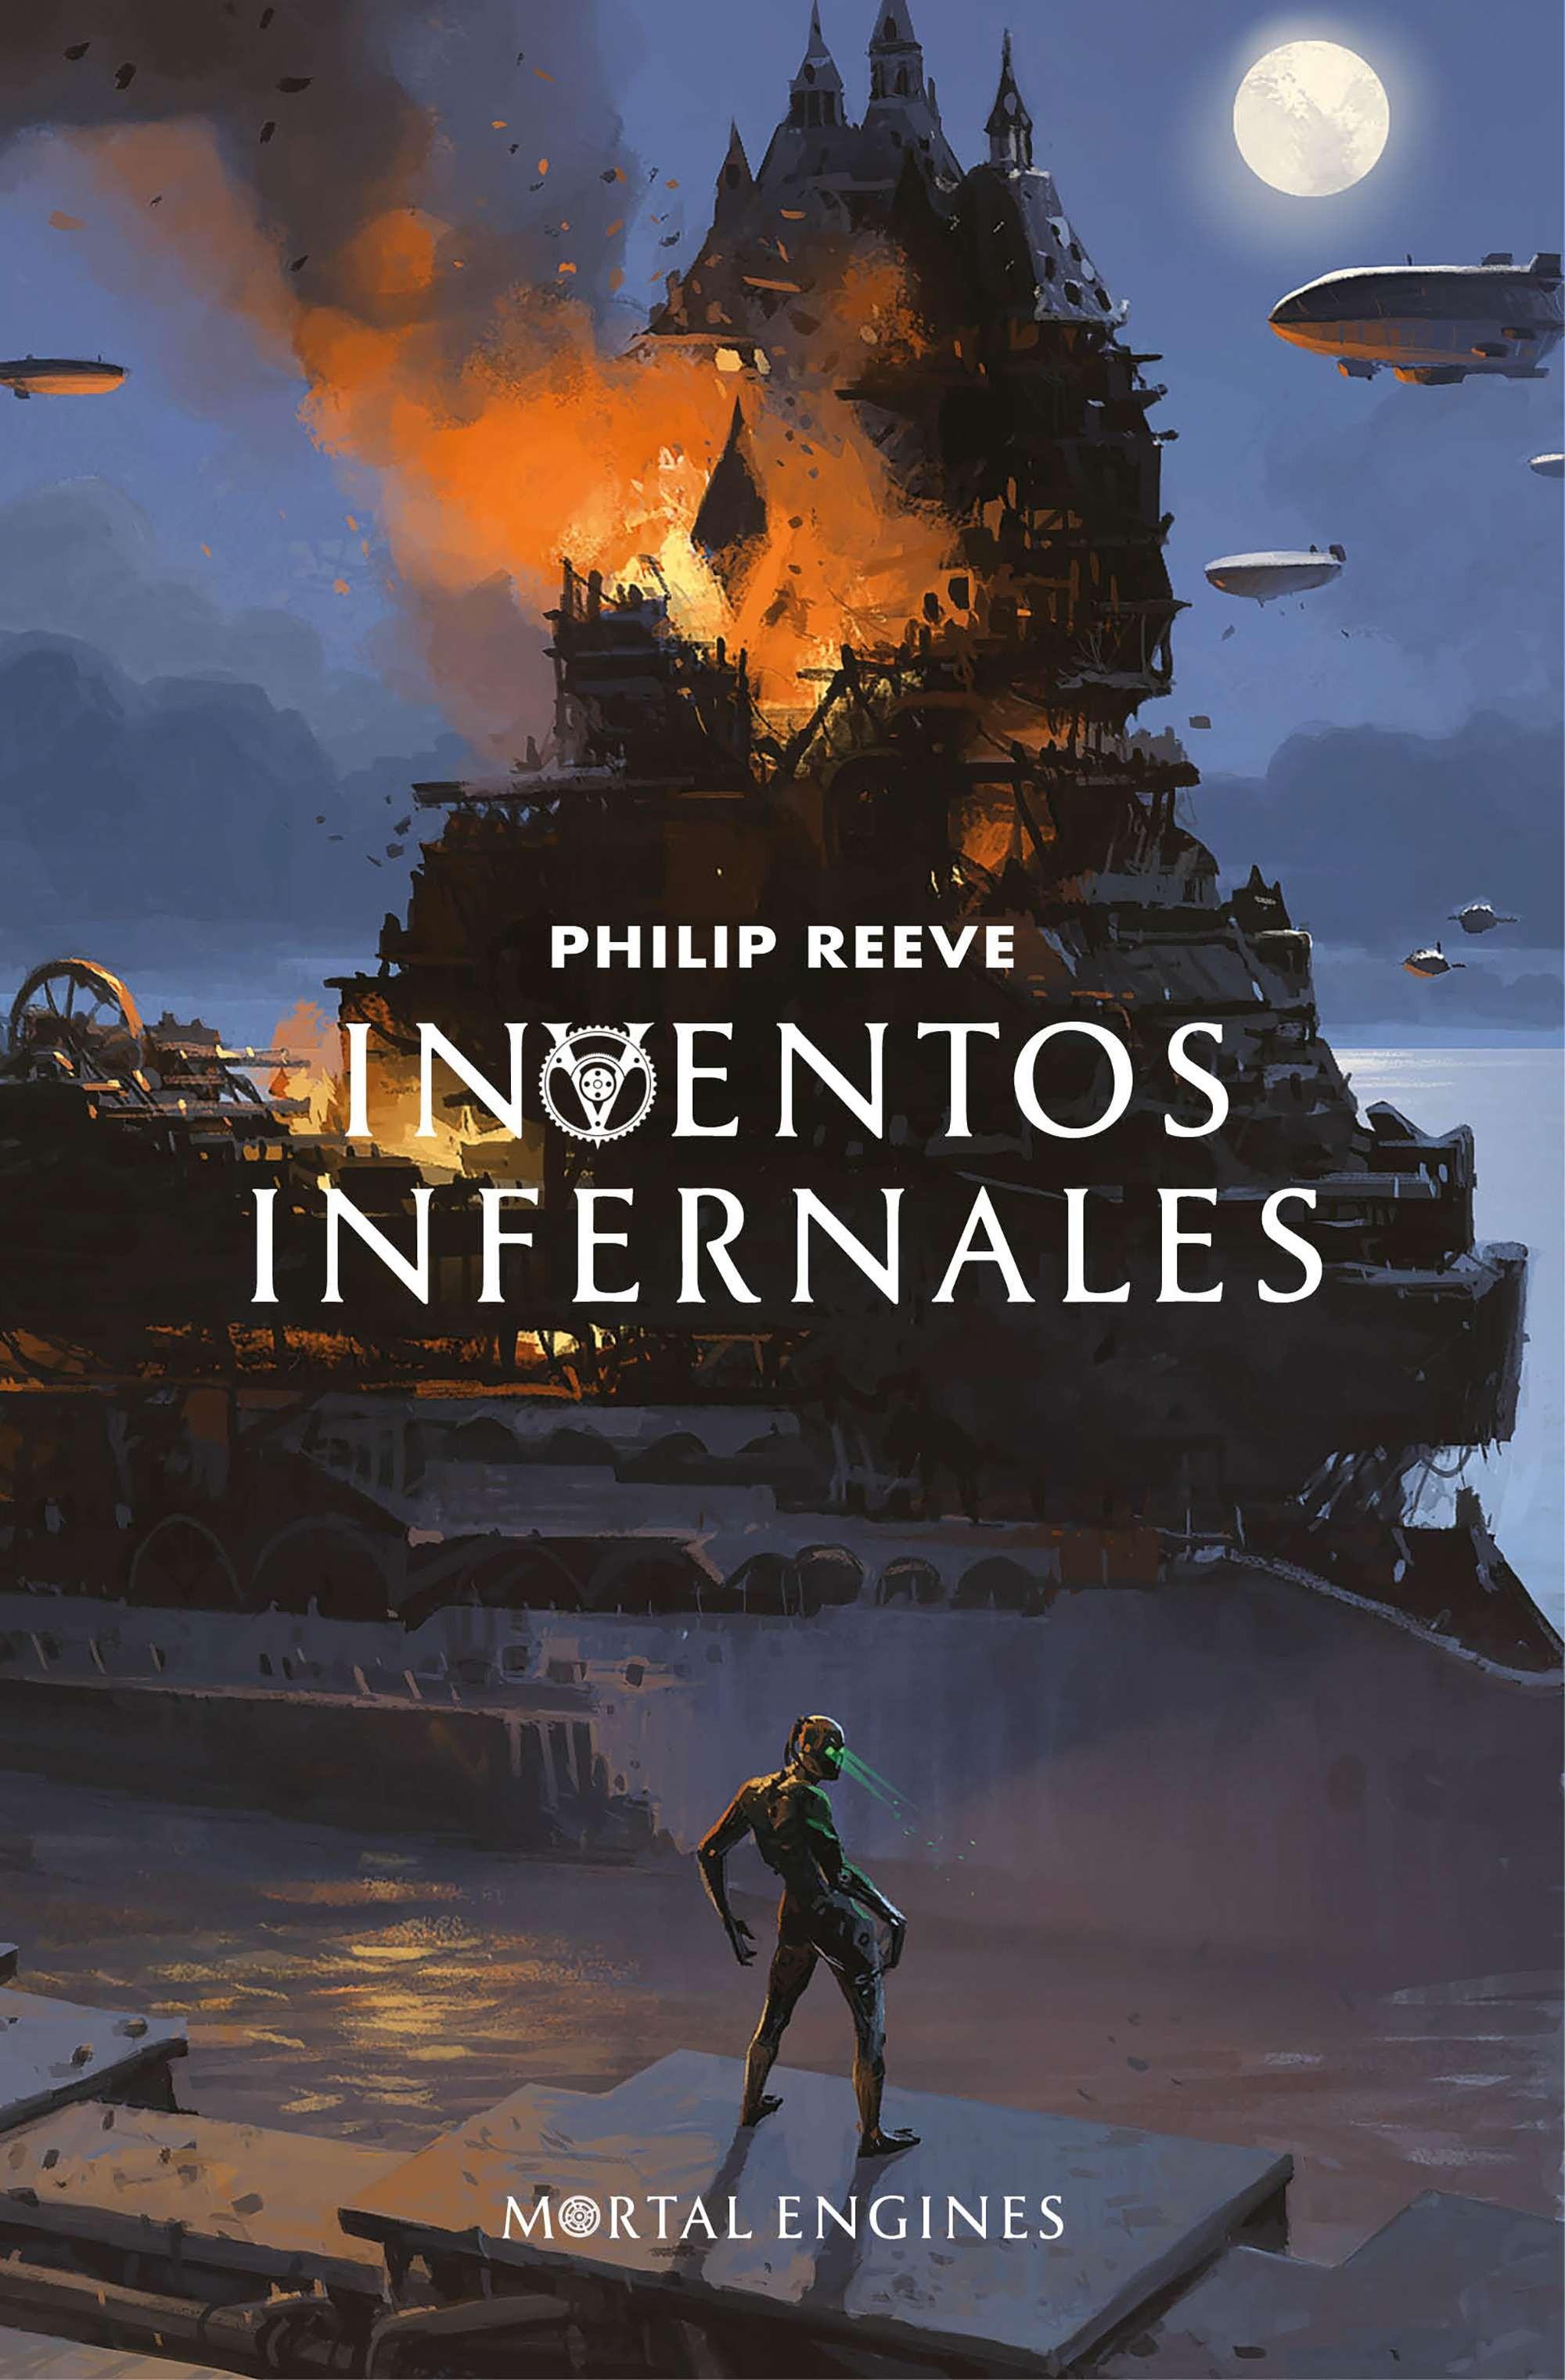 Inventos Infernales - Philip Reeve - Alfaguara